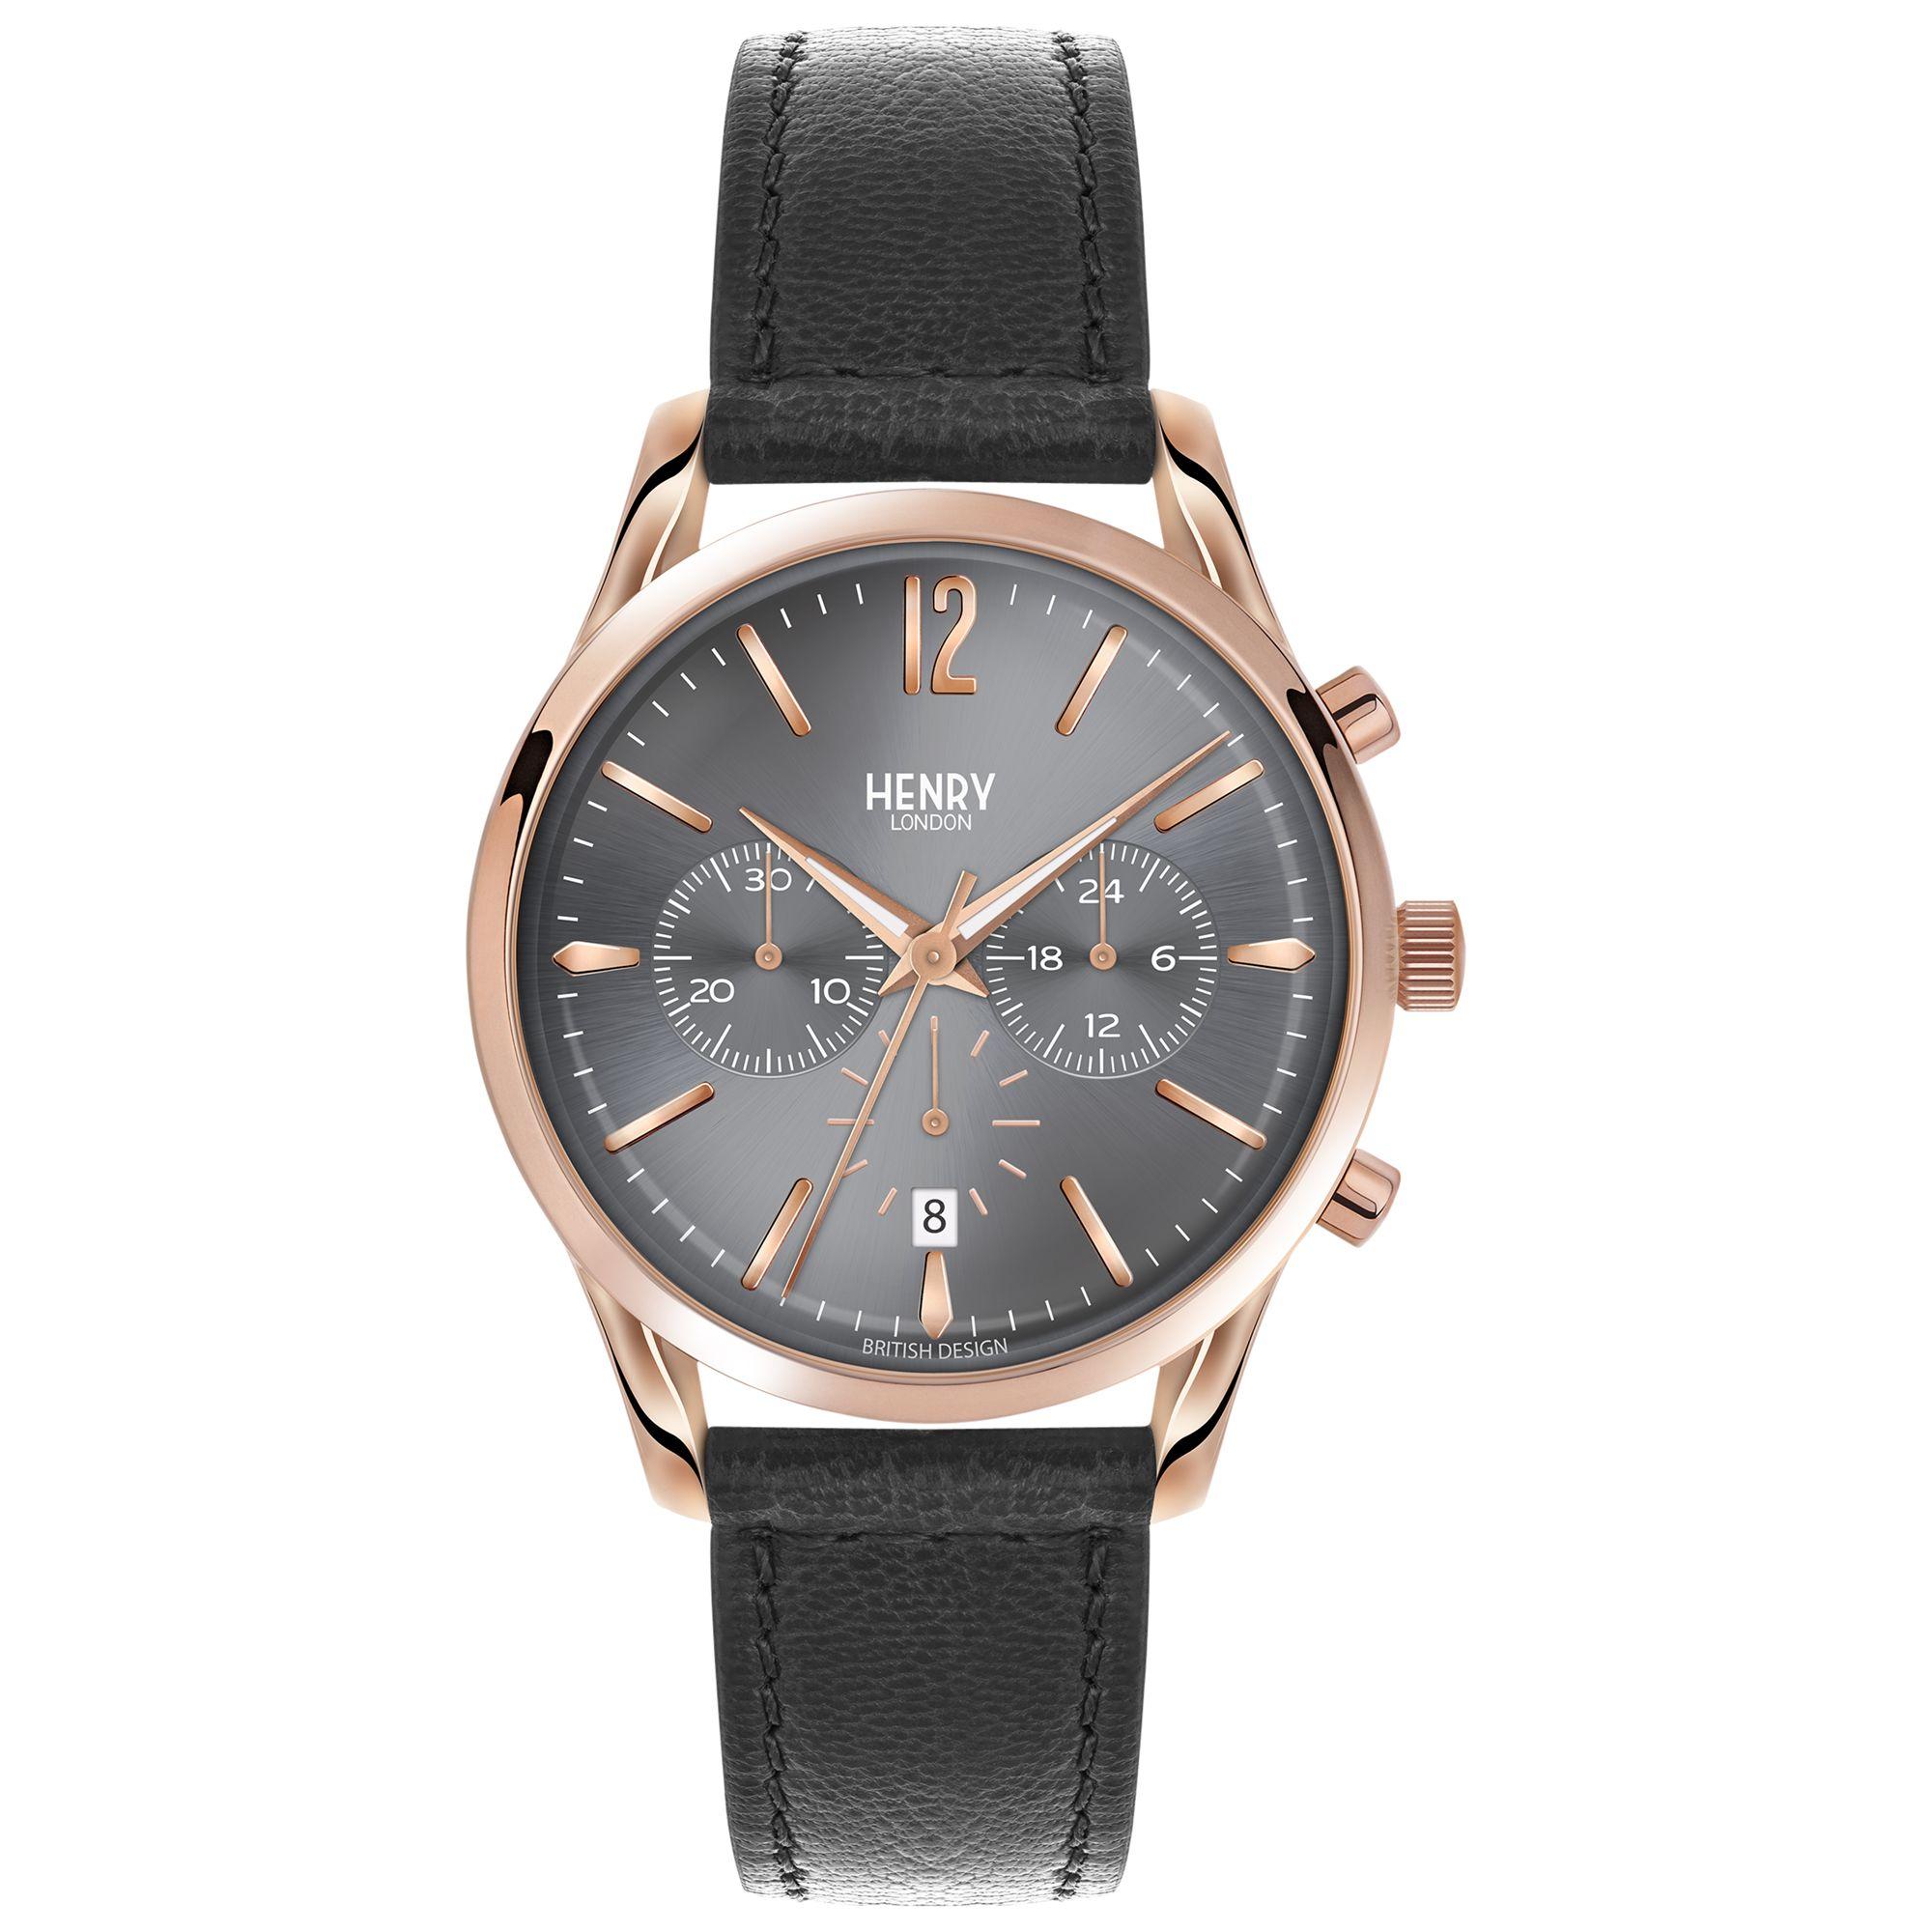 Henry London Henry London HL39-CS-0122 Unisex Finchley Chronograph Date Leather Strap Watch, Black/Grey